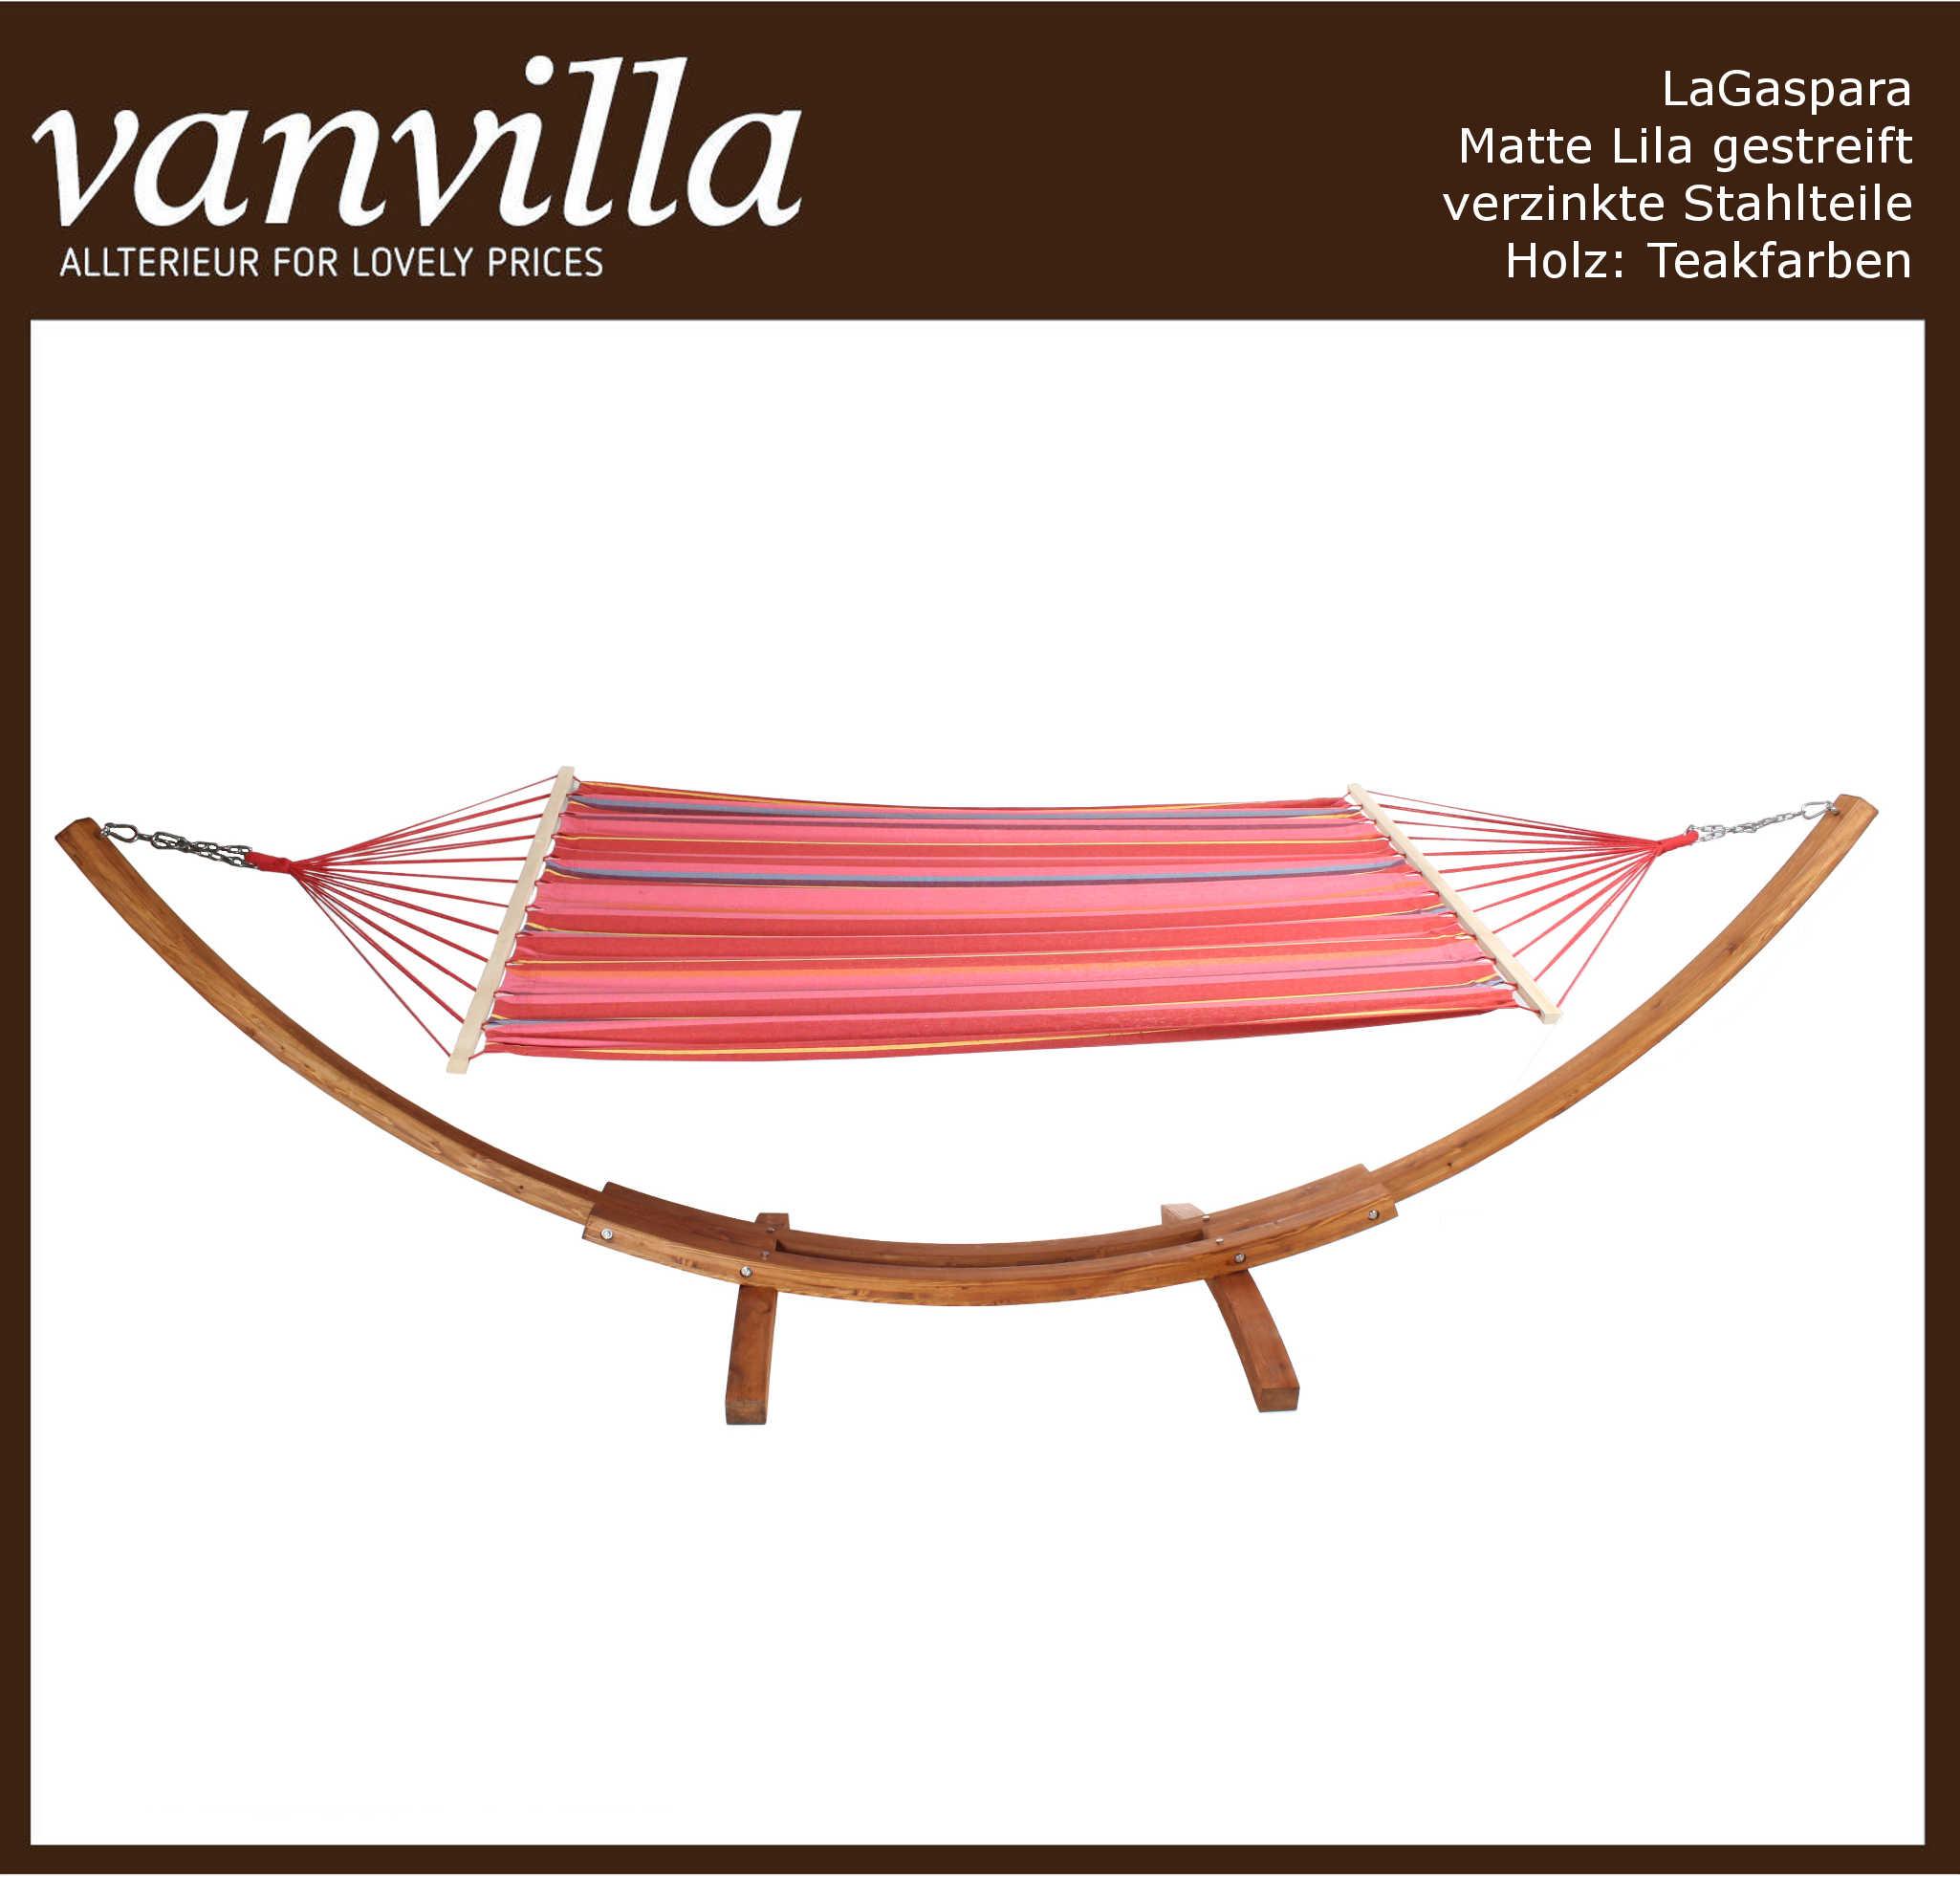 Hängemattengestell LaGaspara Matte Lila gestreift Holz teakfarben 2 Karton